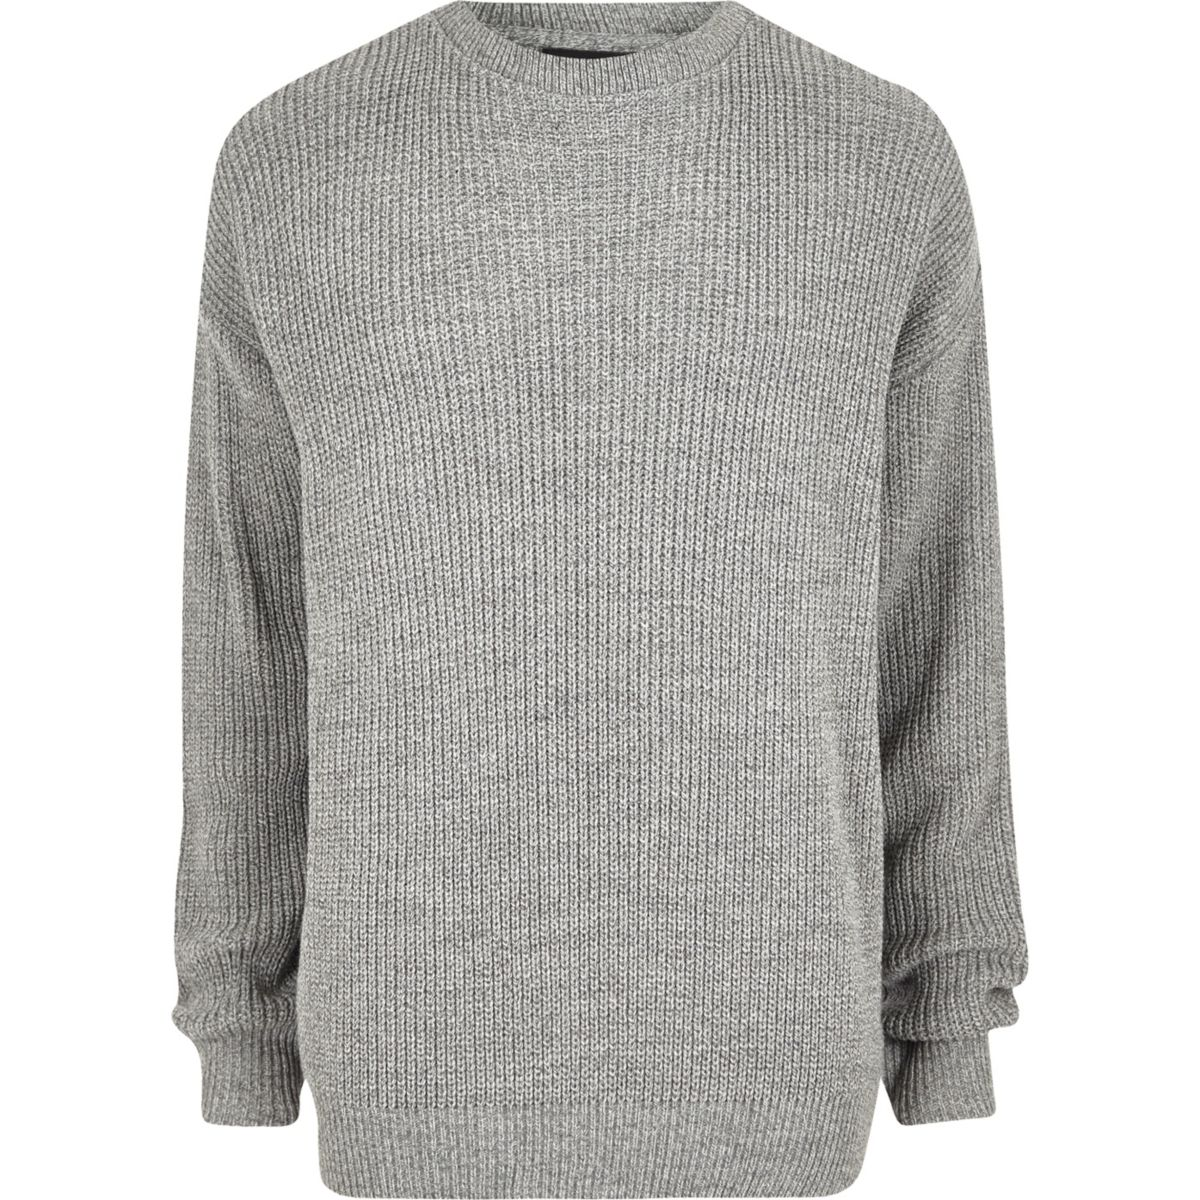 Grey oversized fisherman sweater